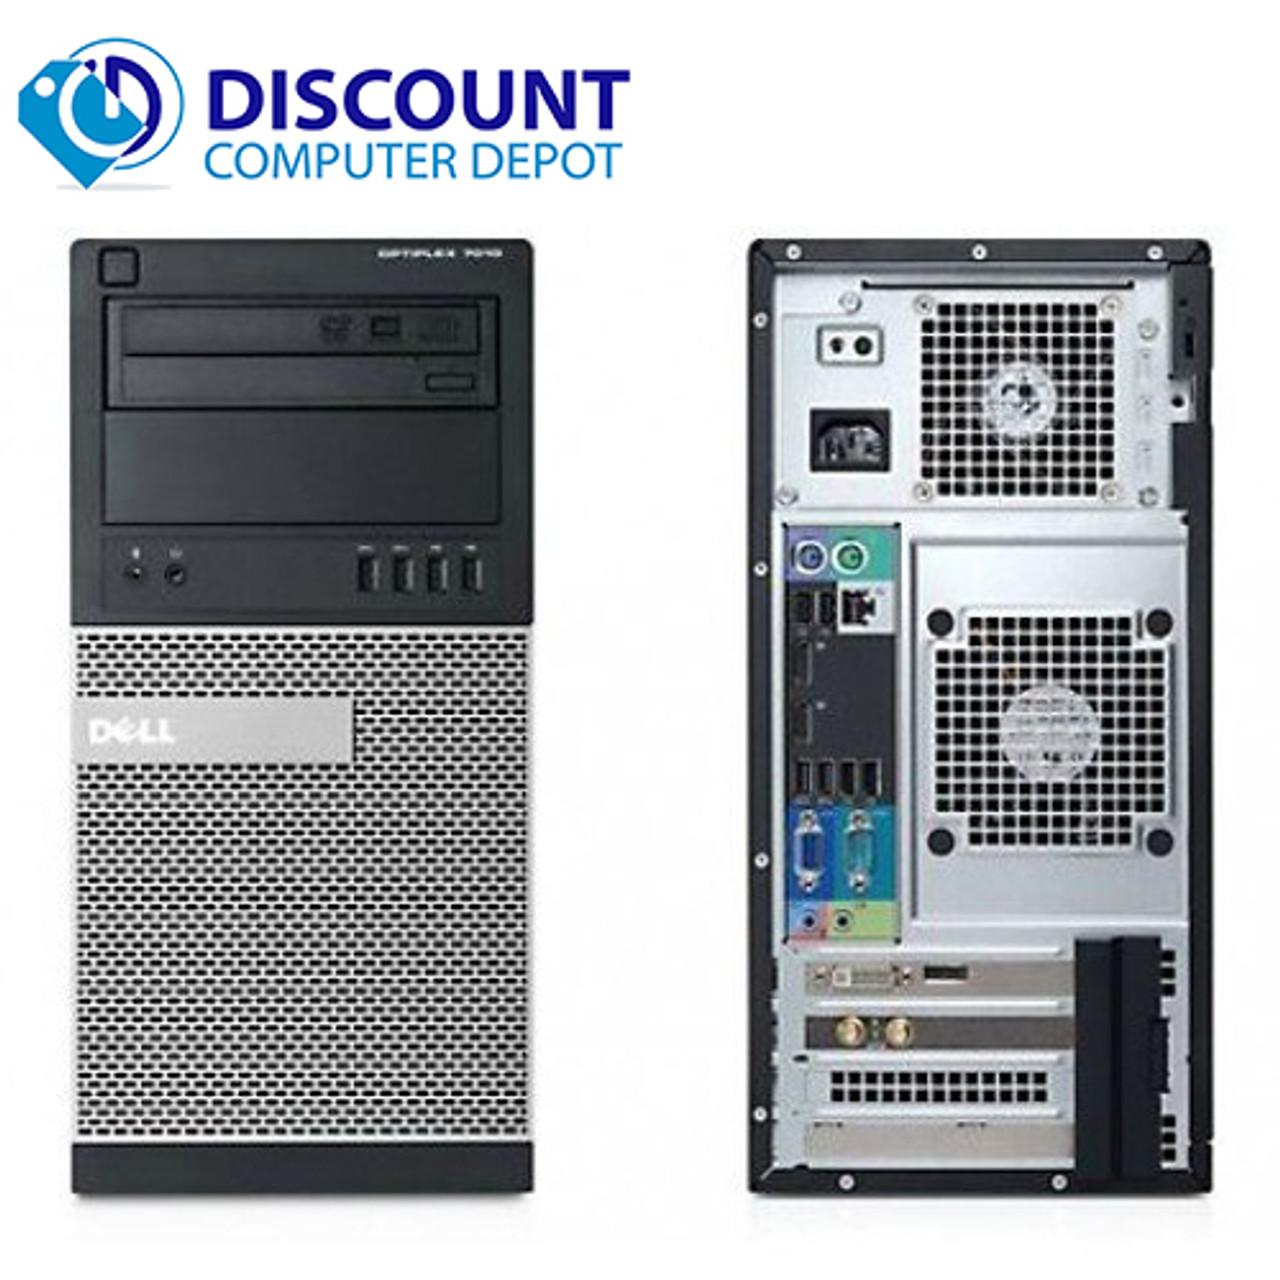 Dell Optiplex 990 Computer Tower Intel i5 3 3GHz 4GB 250GB Windows 10 Home  WiFi